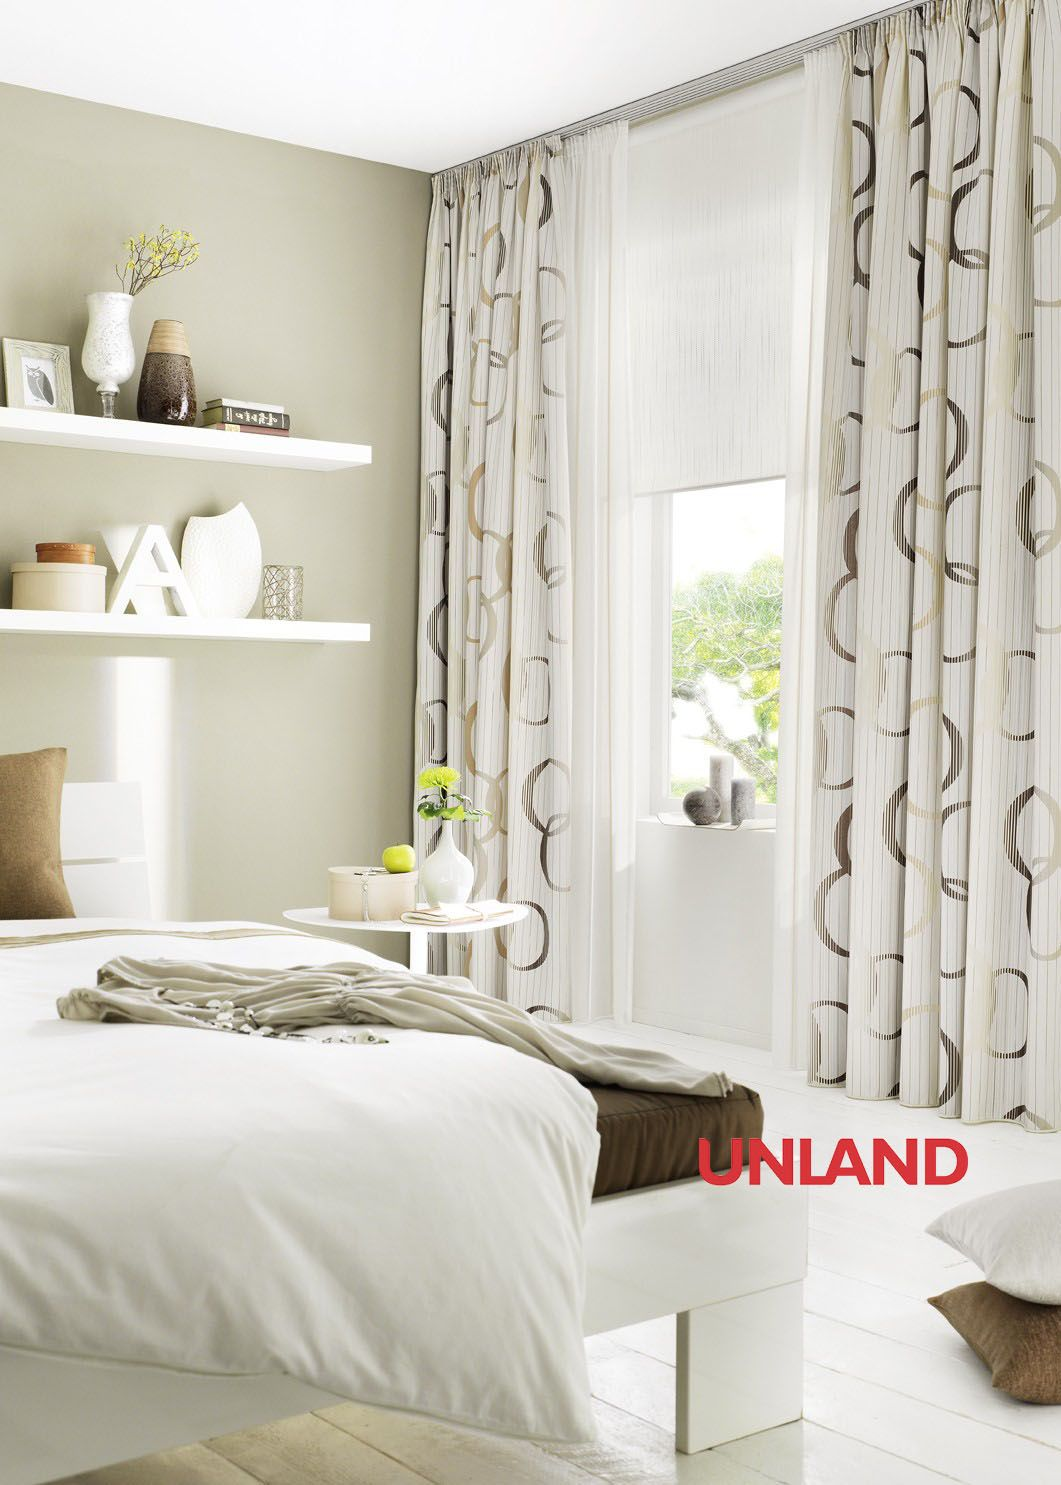 unland ceres fensterideen vorhang gardinen und sonnenschutz curtains contract fabrics. Black Bedroom Furniture Sets. Home Design Ideas